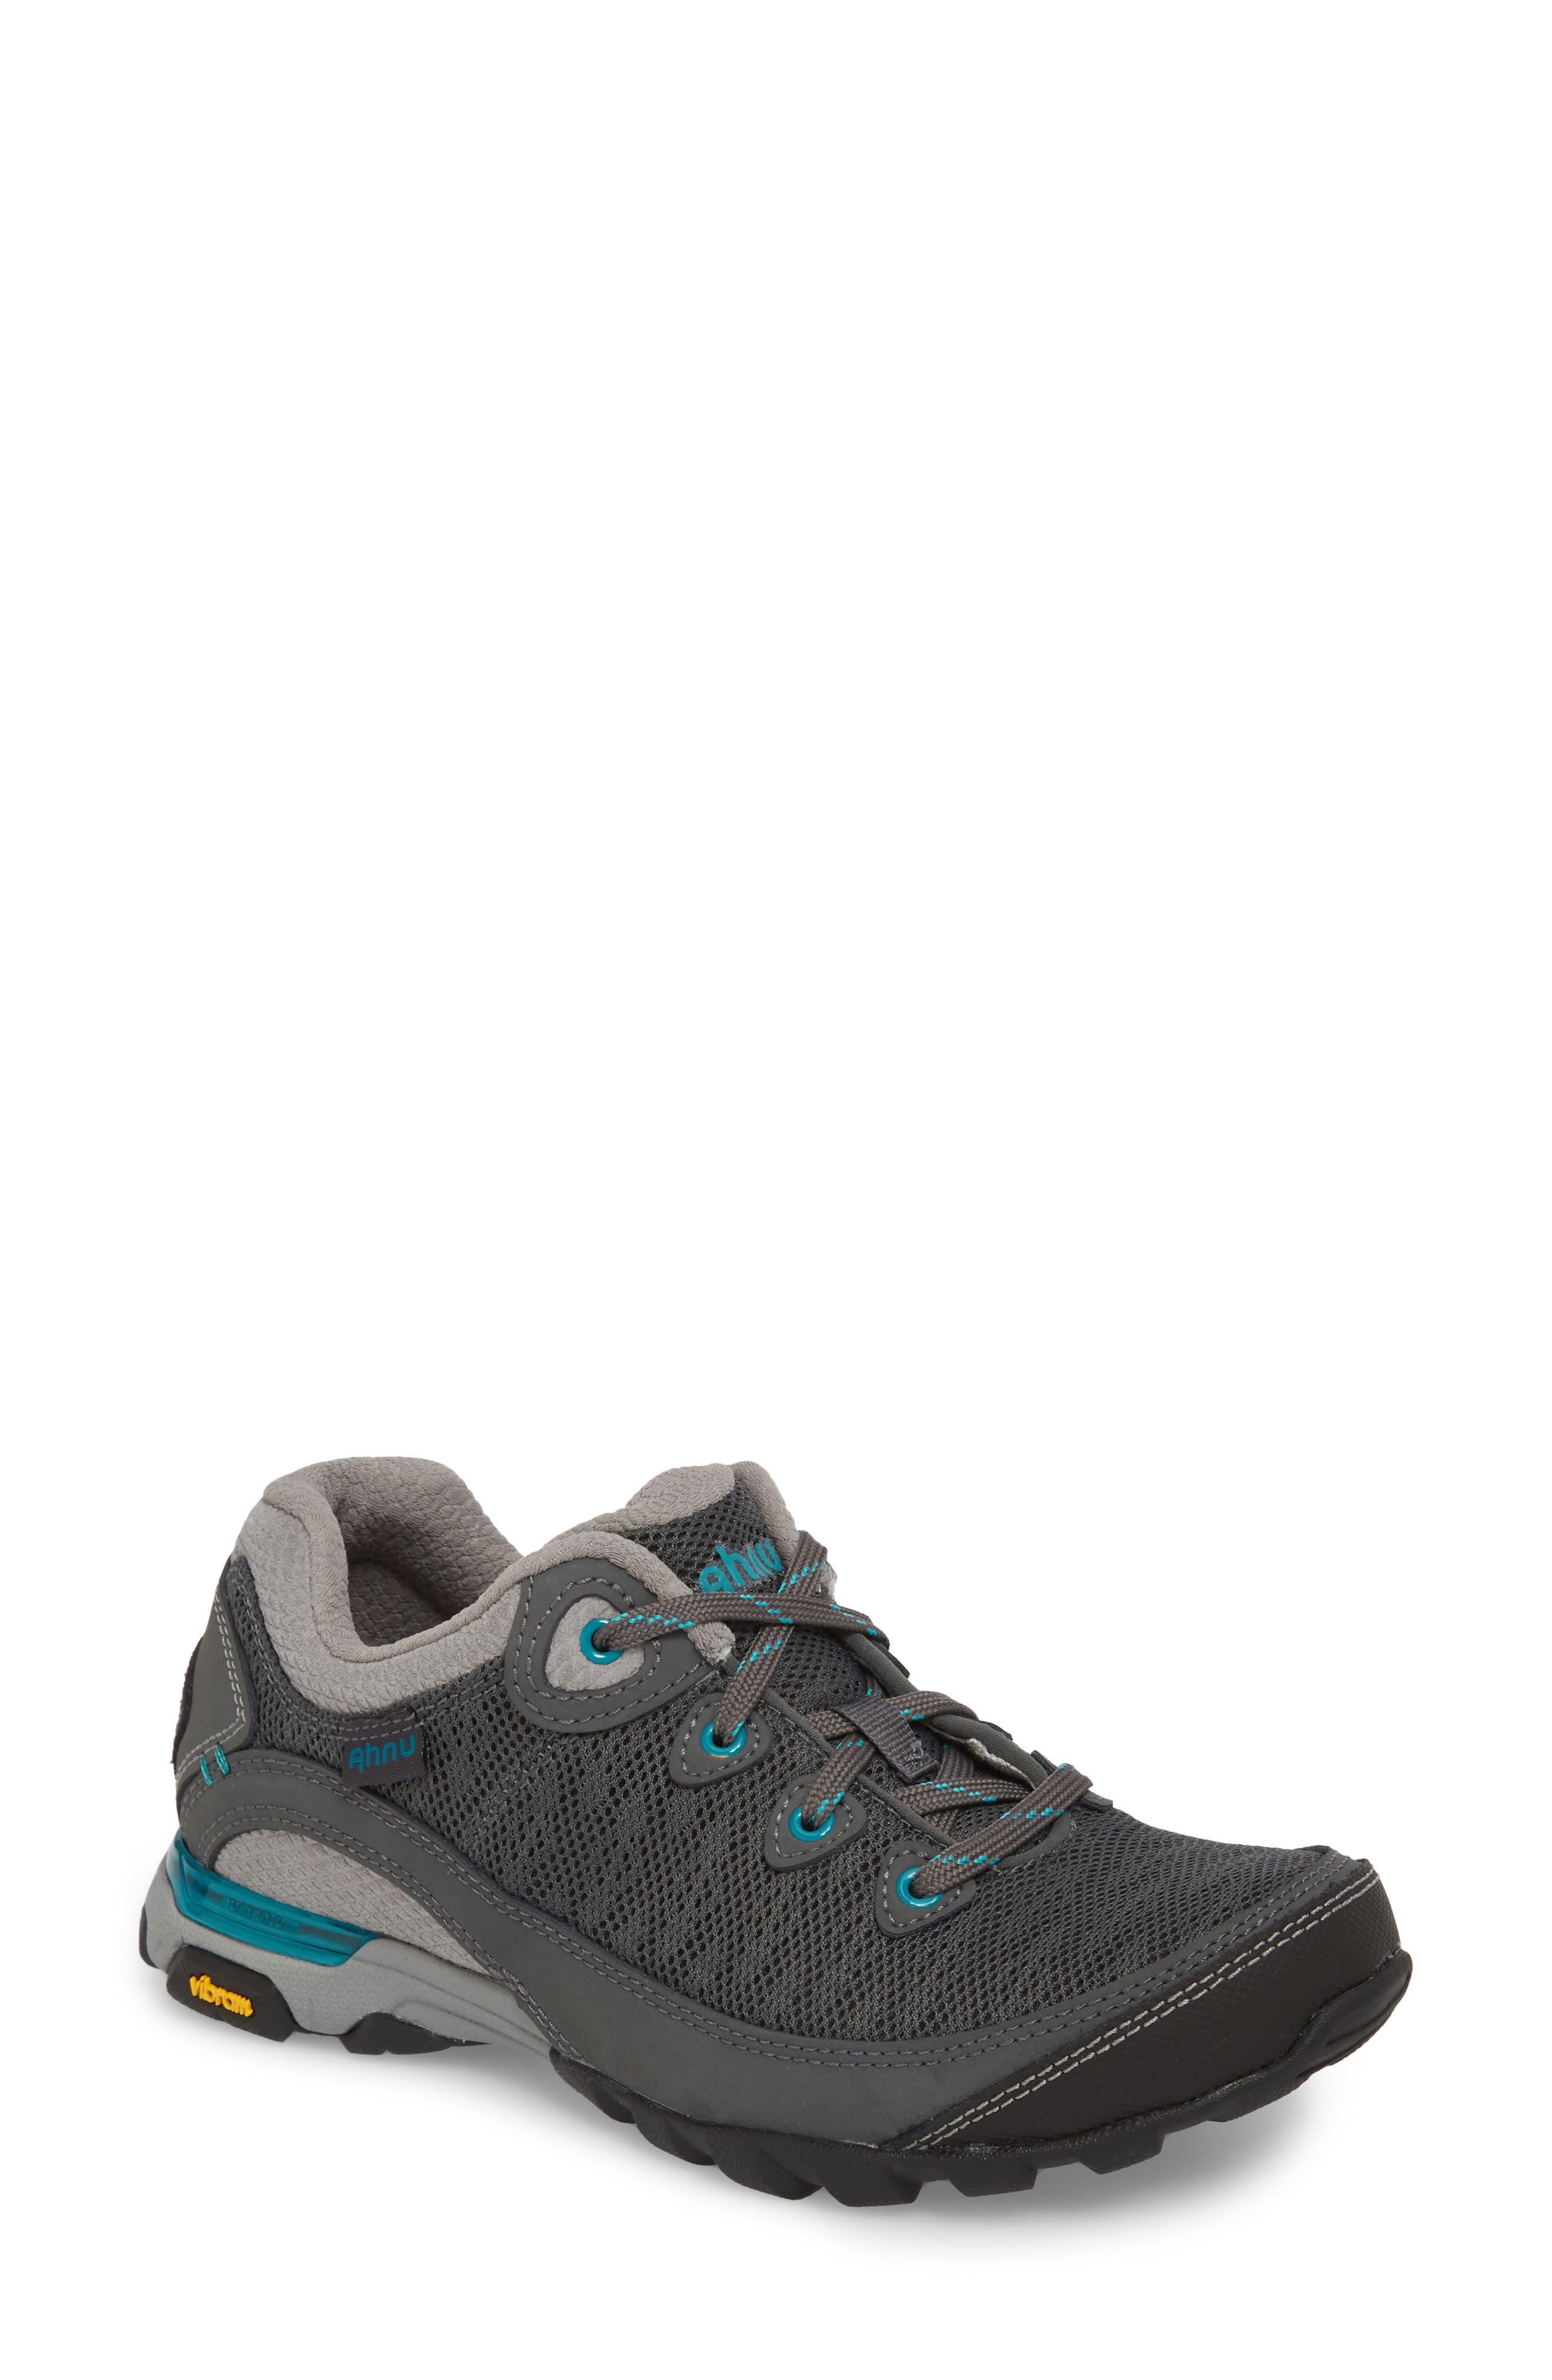 Ahnu by Teva Sugarpine II Air Mesh Hiking Waterproof Sneaker,                             Main thumbnail 1, color,                             025